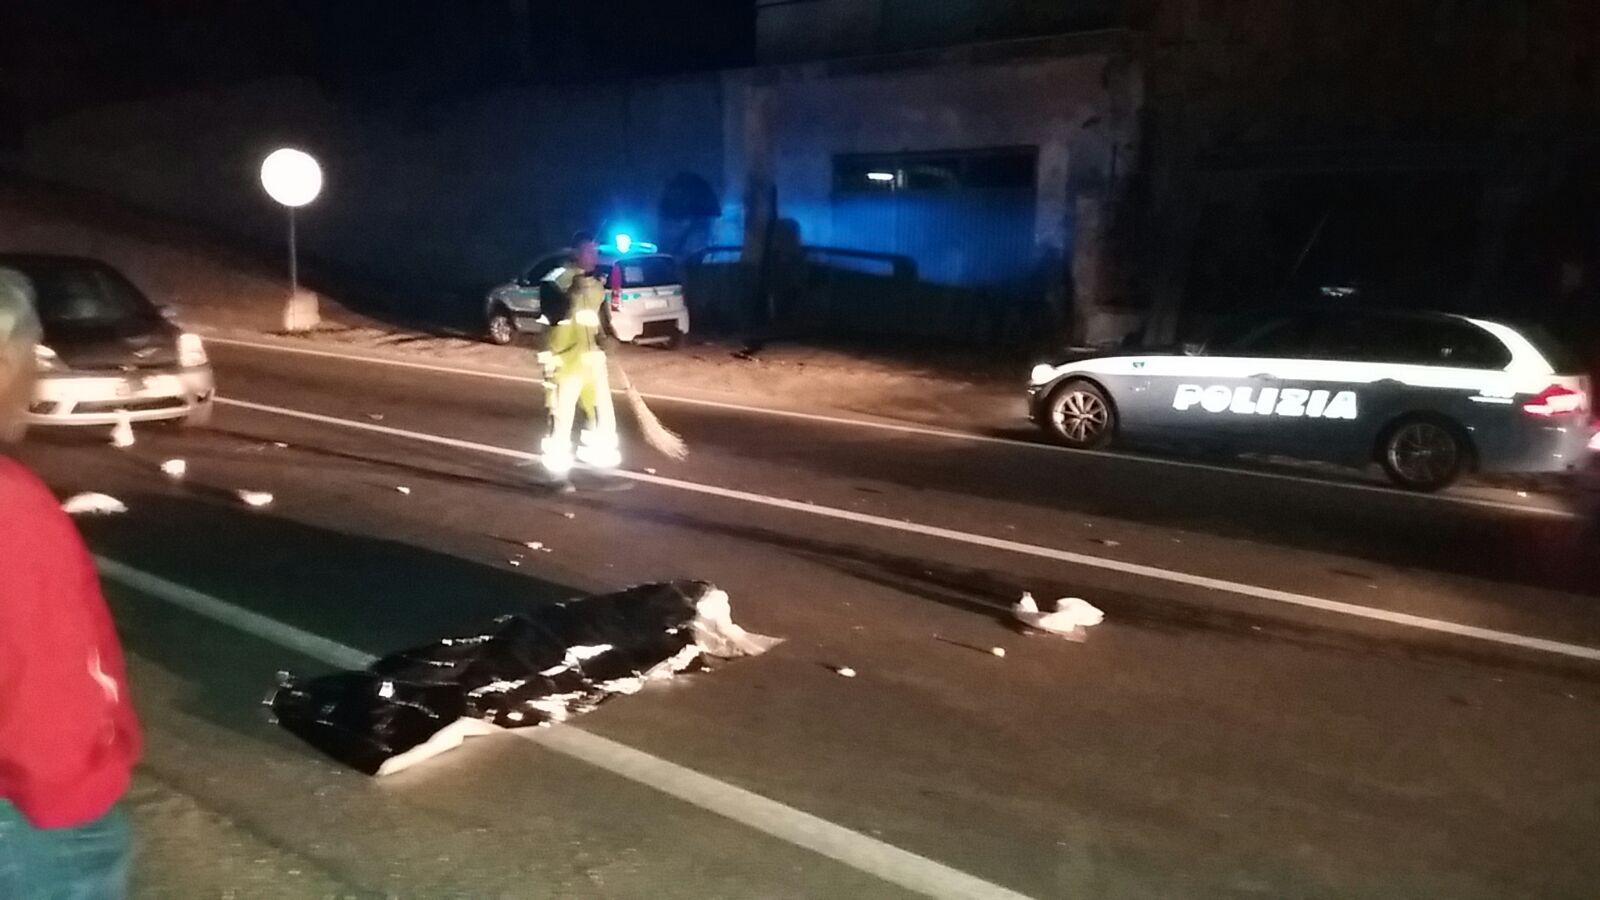 incidente a fuscaldo, incidente stradale